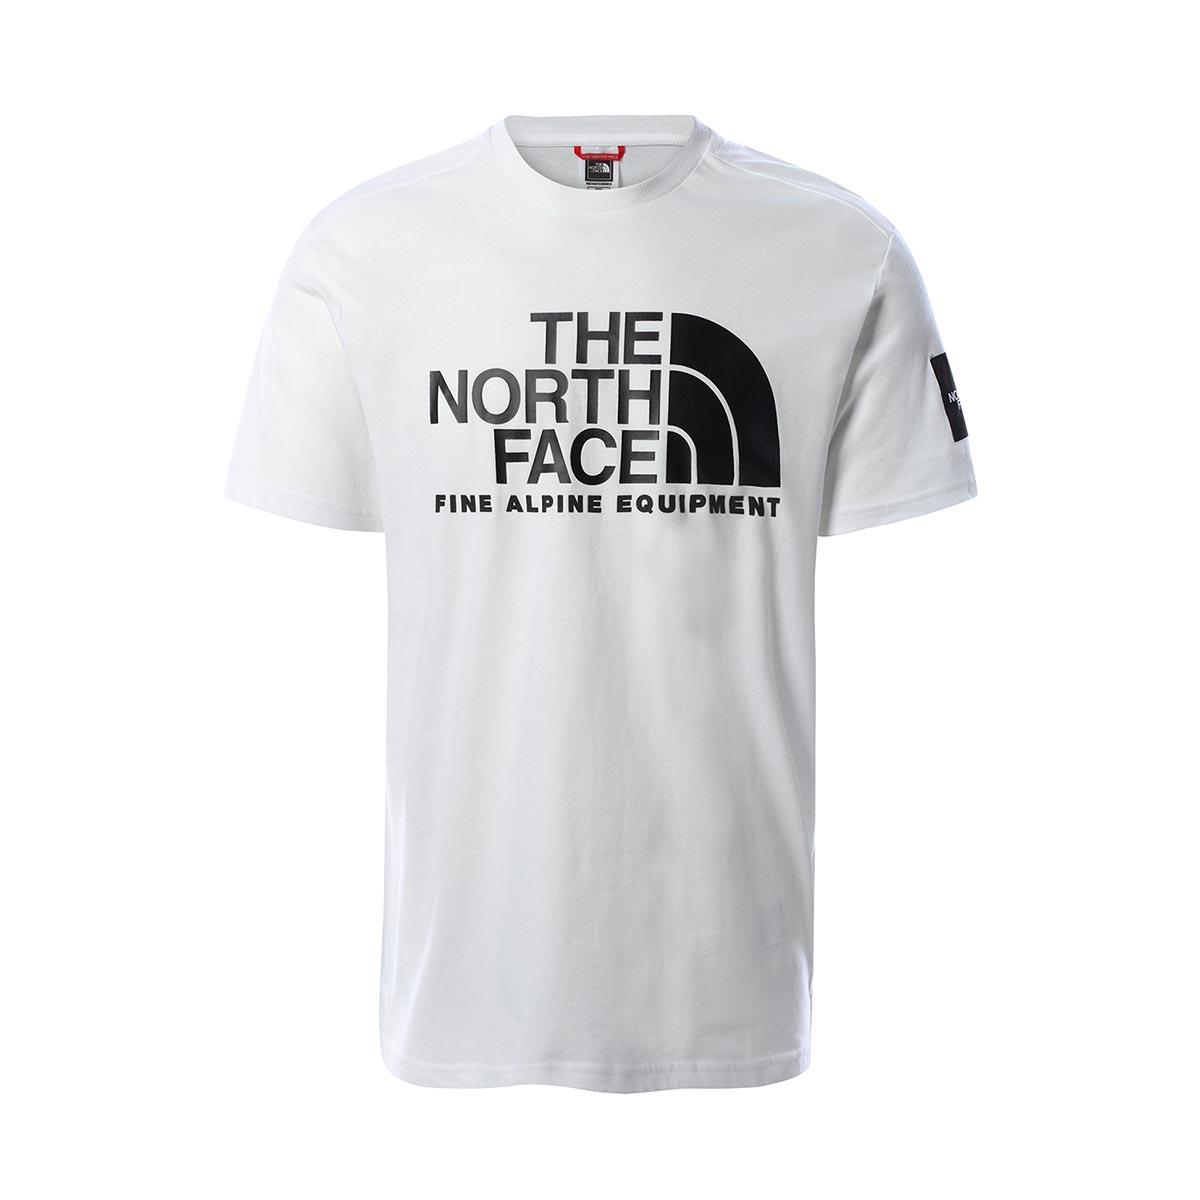 THE NORTH FACE - FINE ALPINE 2 T-SHIRT